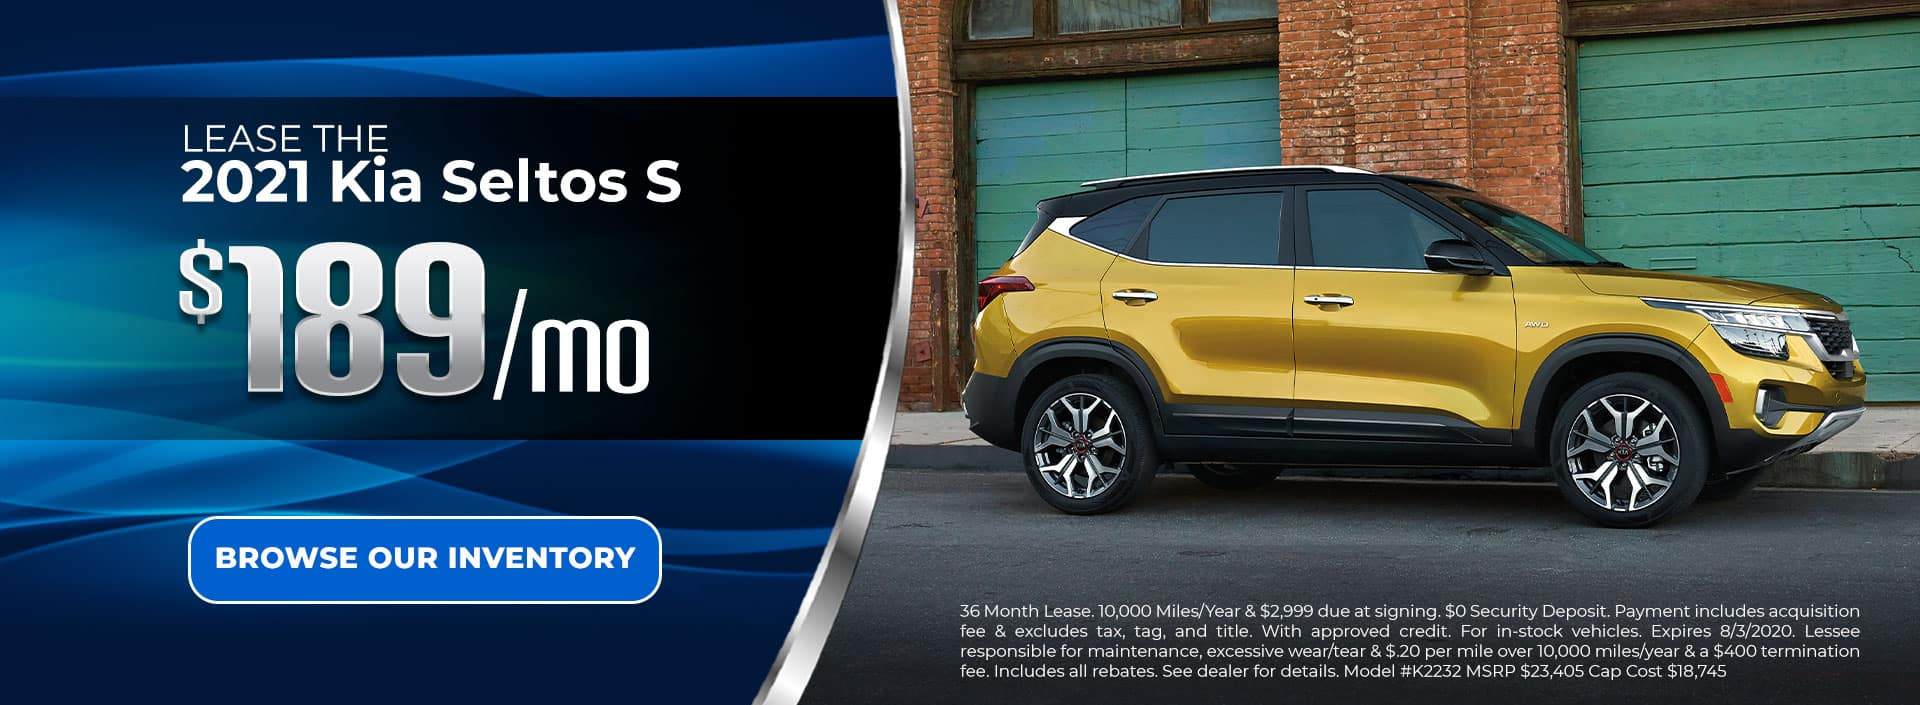 Lease 2021 Seltos S for $189/mo